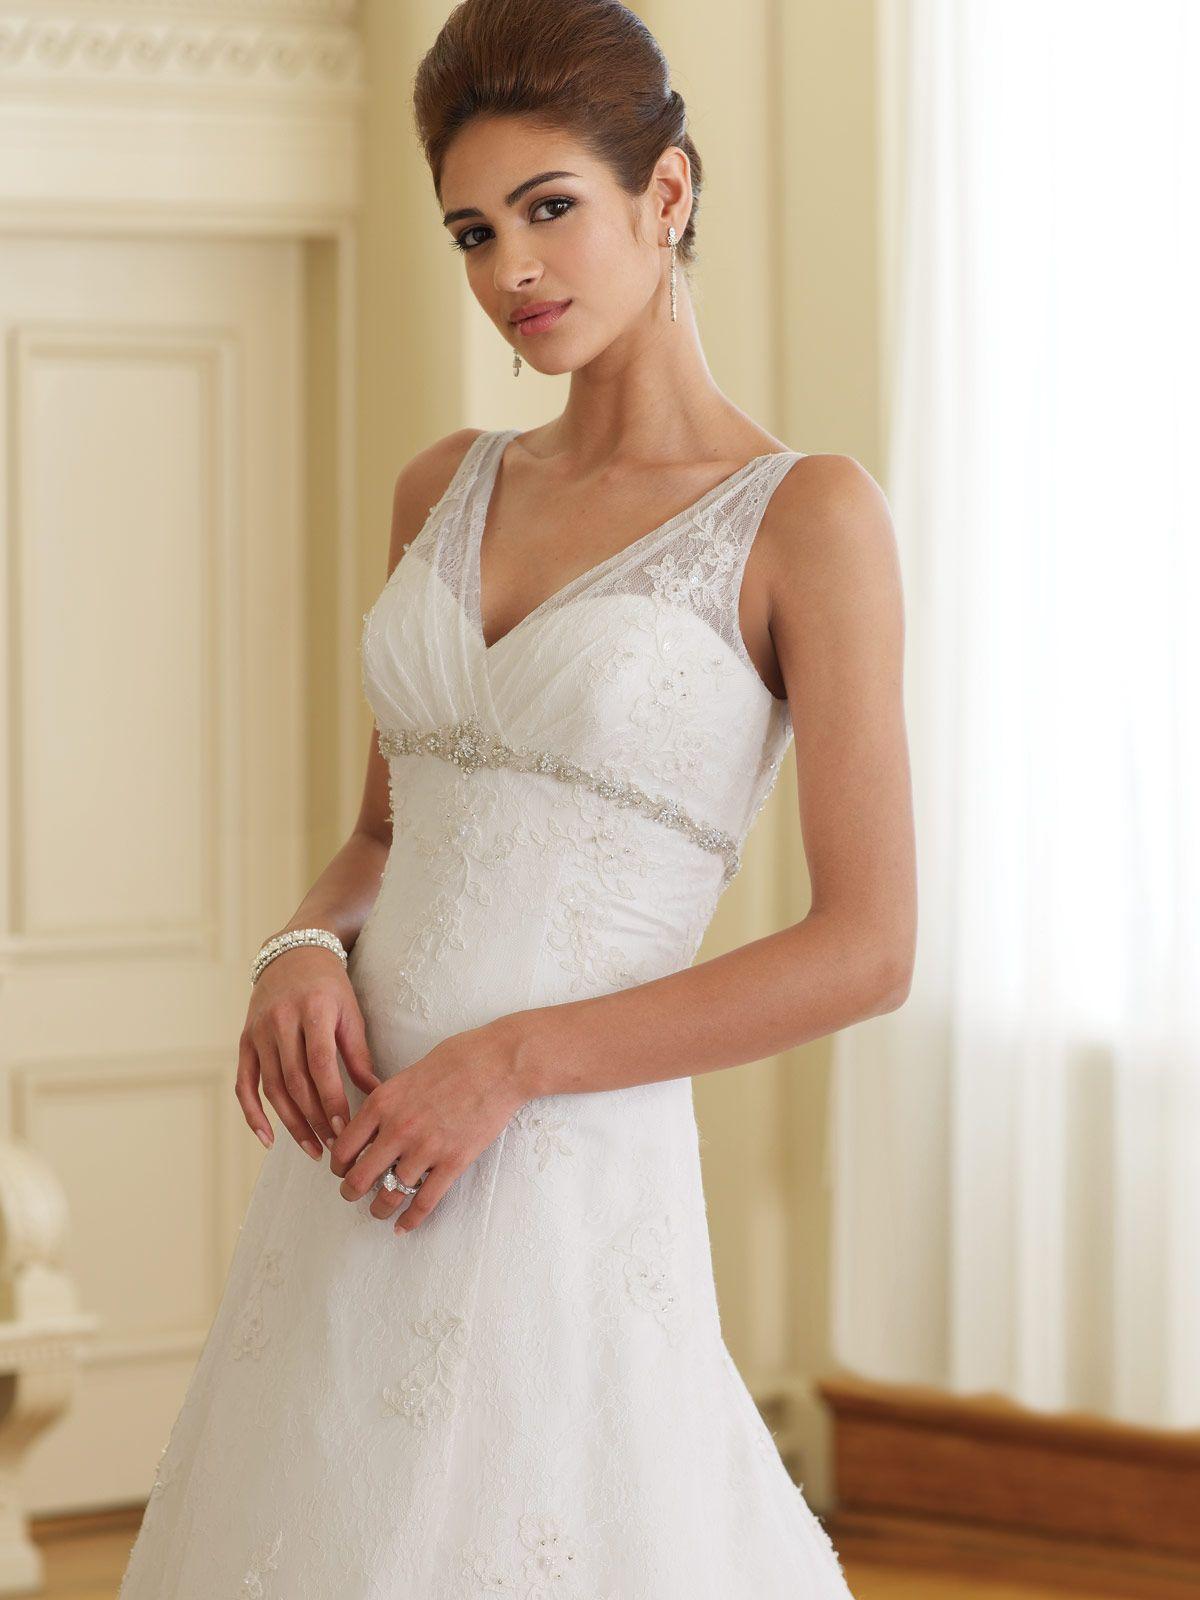 bride wedding dress best wedding dress for petite brides Choose Suitable Petite Wedding Dresses